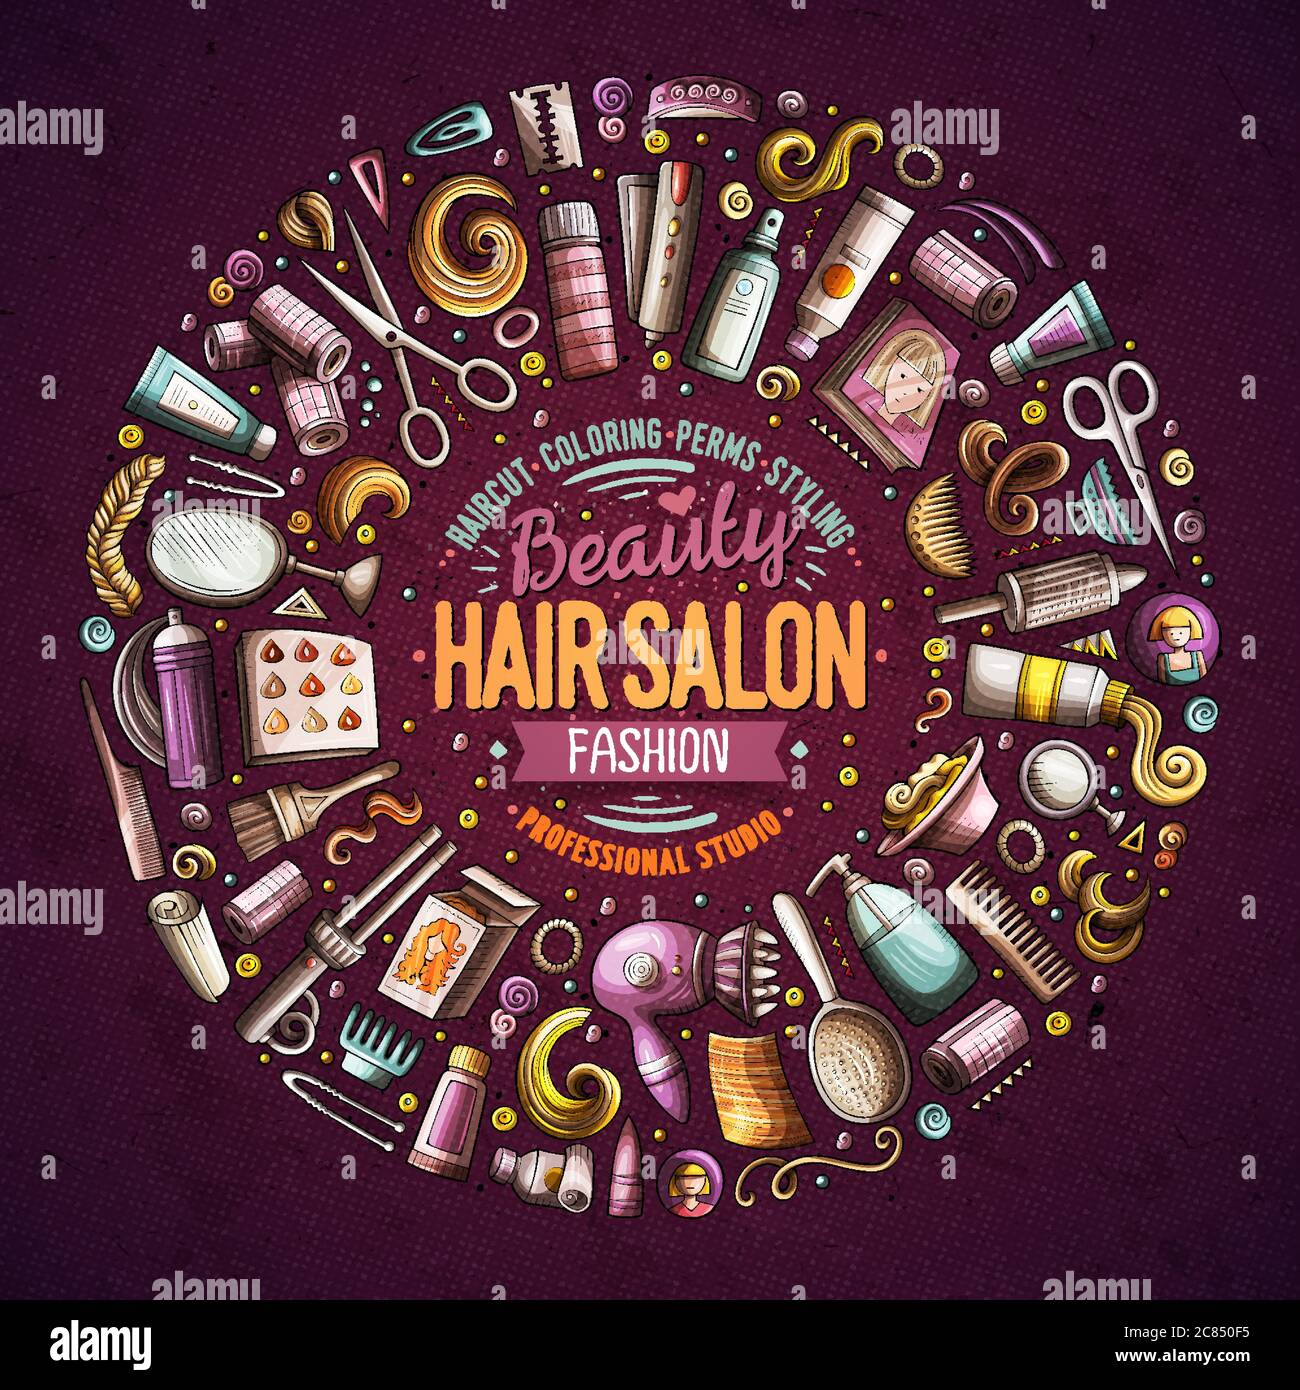 Vector Set Of Hair Salon Cartoon Doodle Objects Stock Vector Image Art Alamy